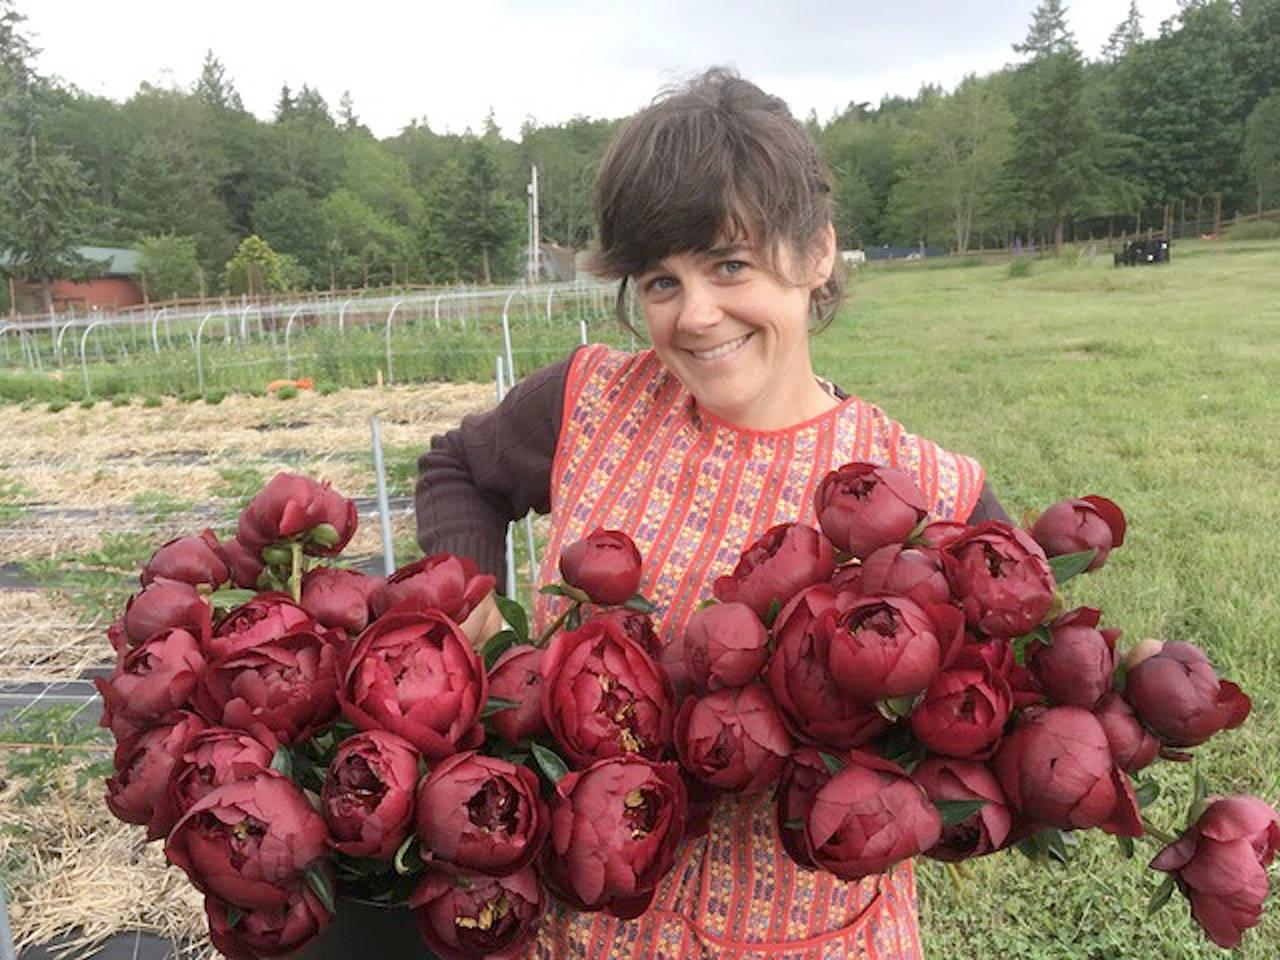 Caitlin Carnahan is the farmer at Diamond Day Bouquet in Chimacum. (Photo courtesy of Caitlin Carnahan)